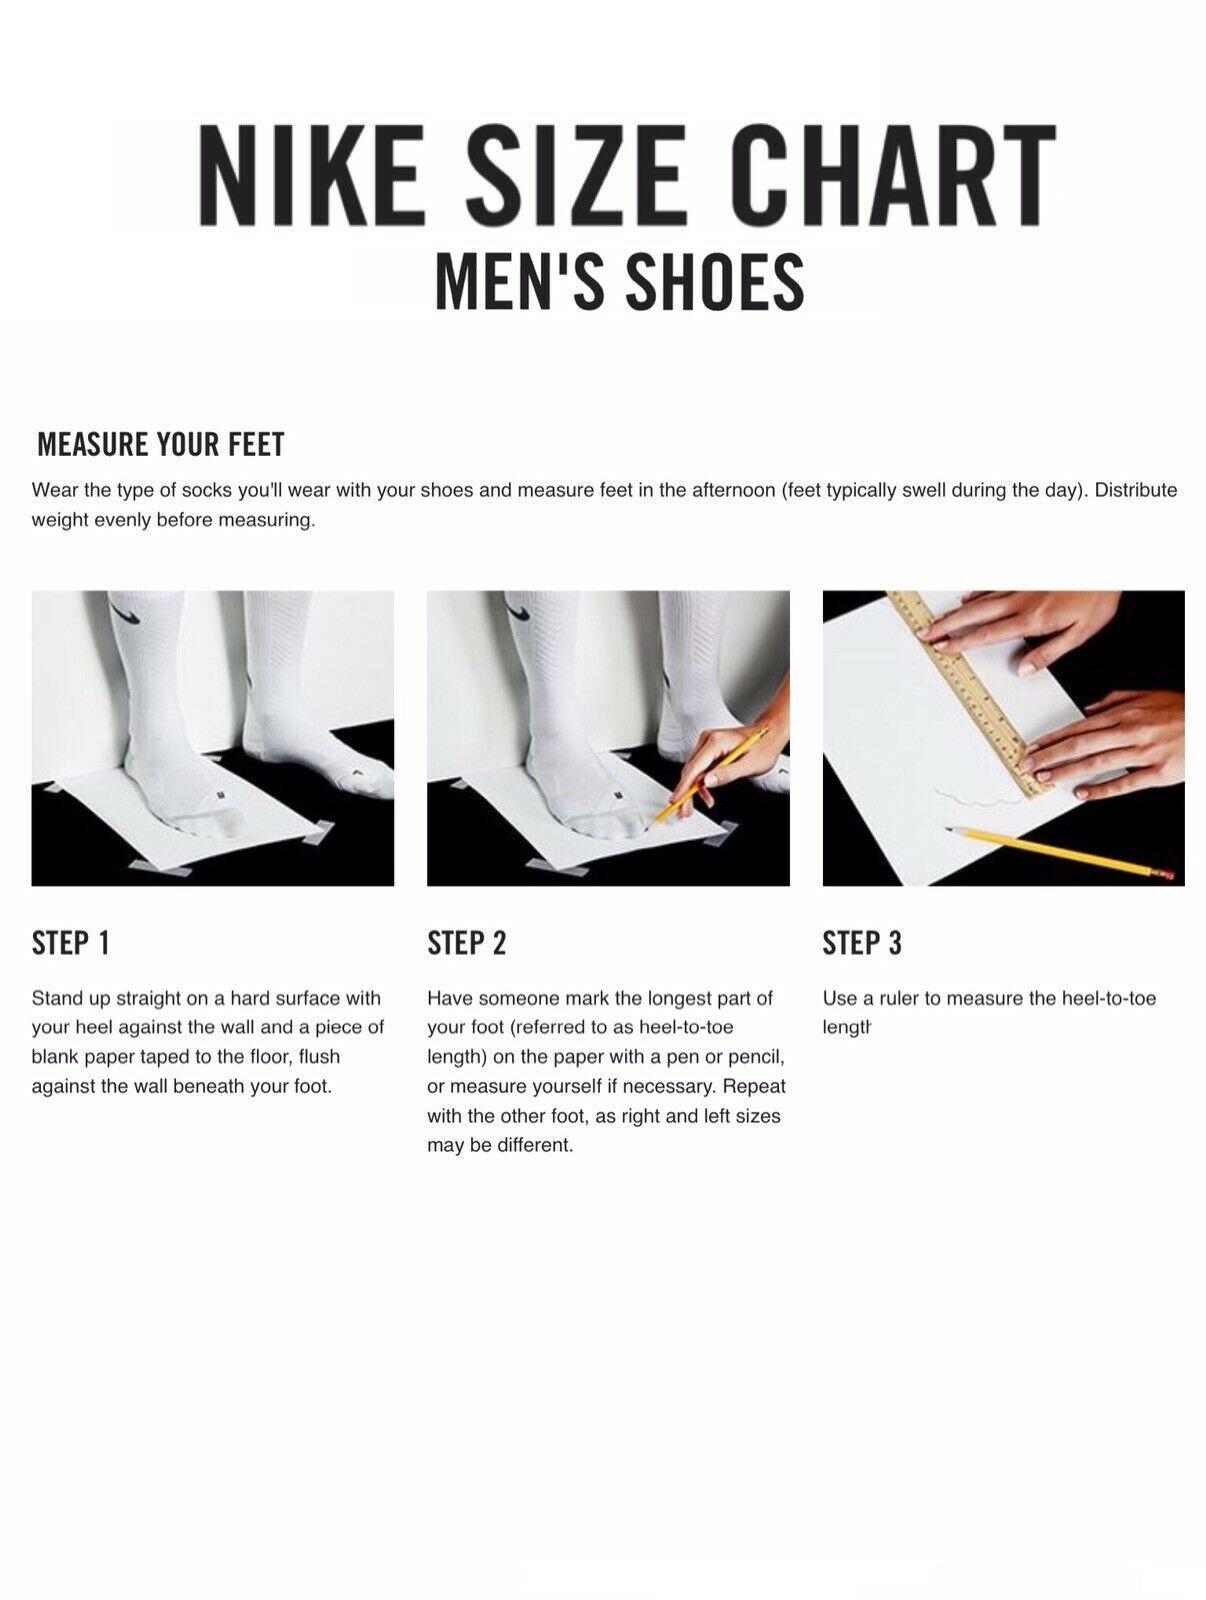 Nike 880319-100 Men's 12 Vapor Varsity Low TD Football Cleats $85 CLEARANCE